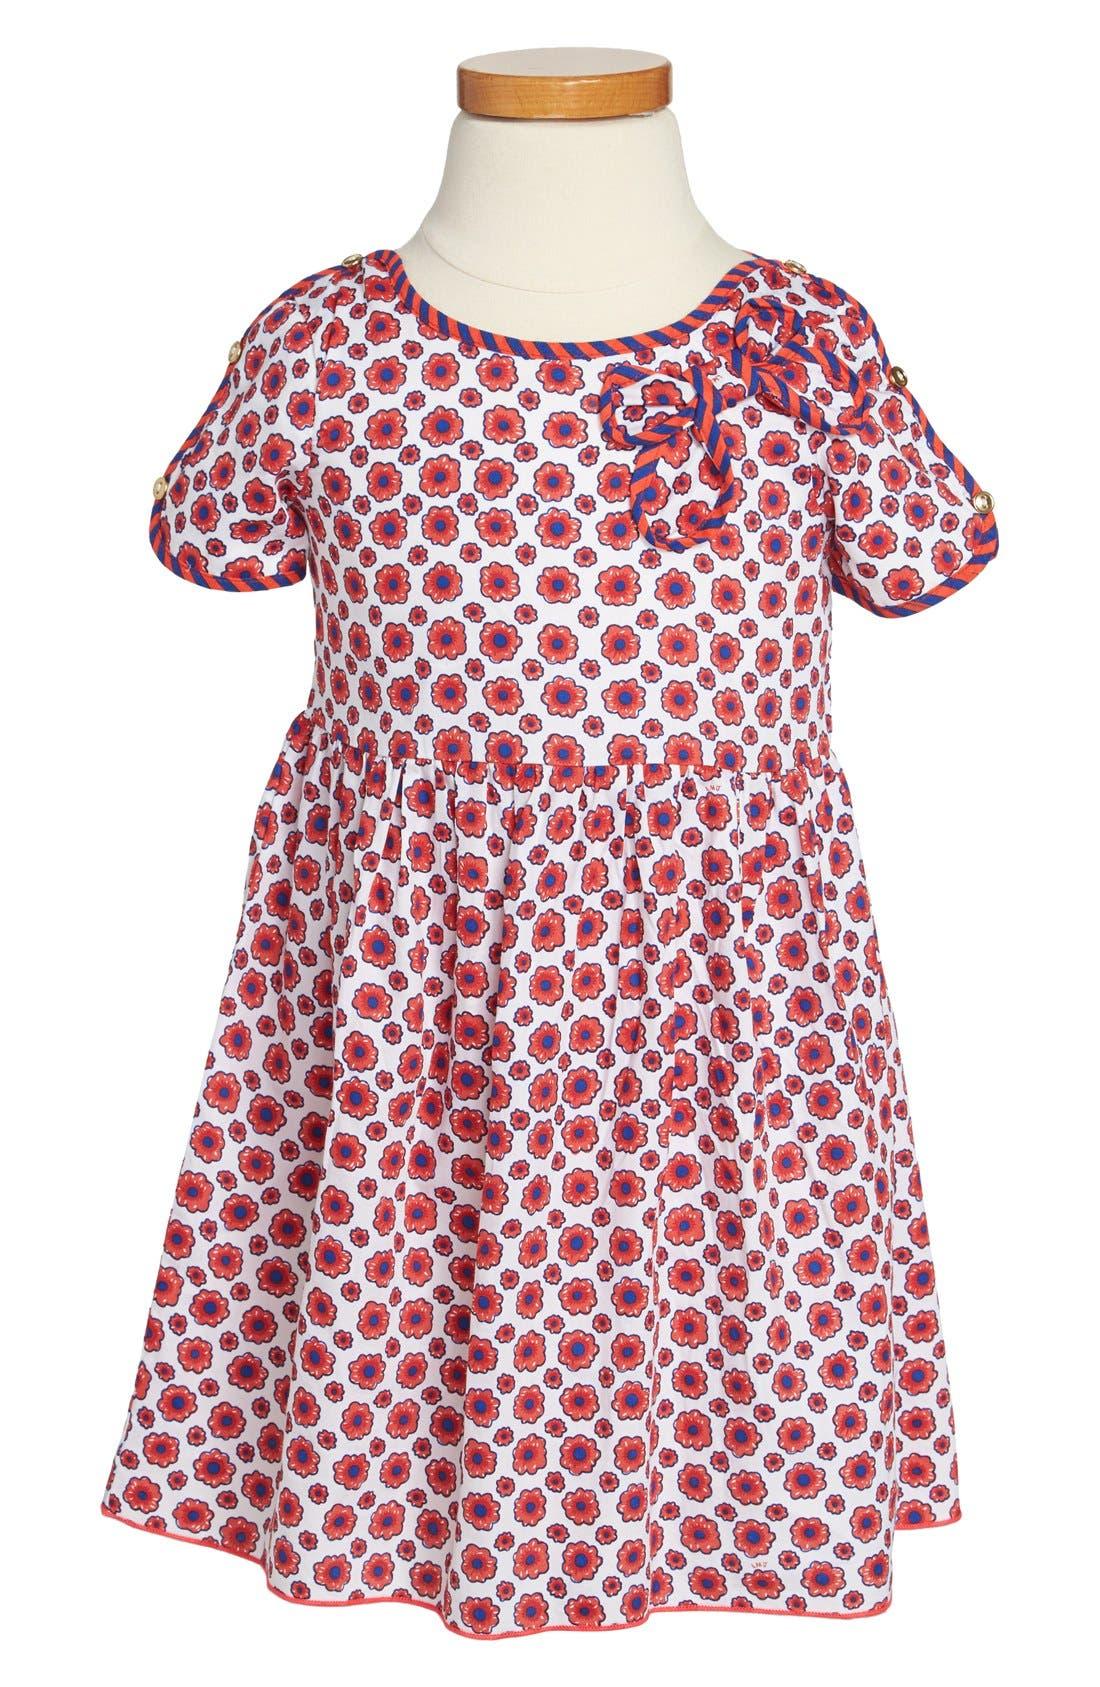 Main Image - LITTLE MARC JACOBS Floral Print Woven Dress (Toddler Girls)